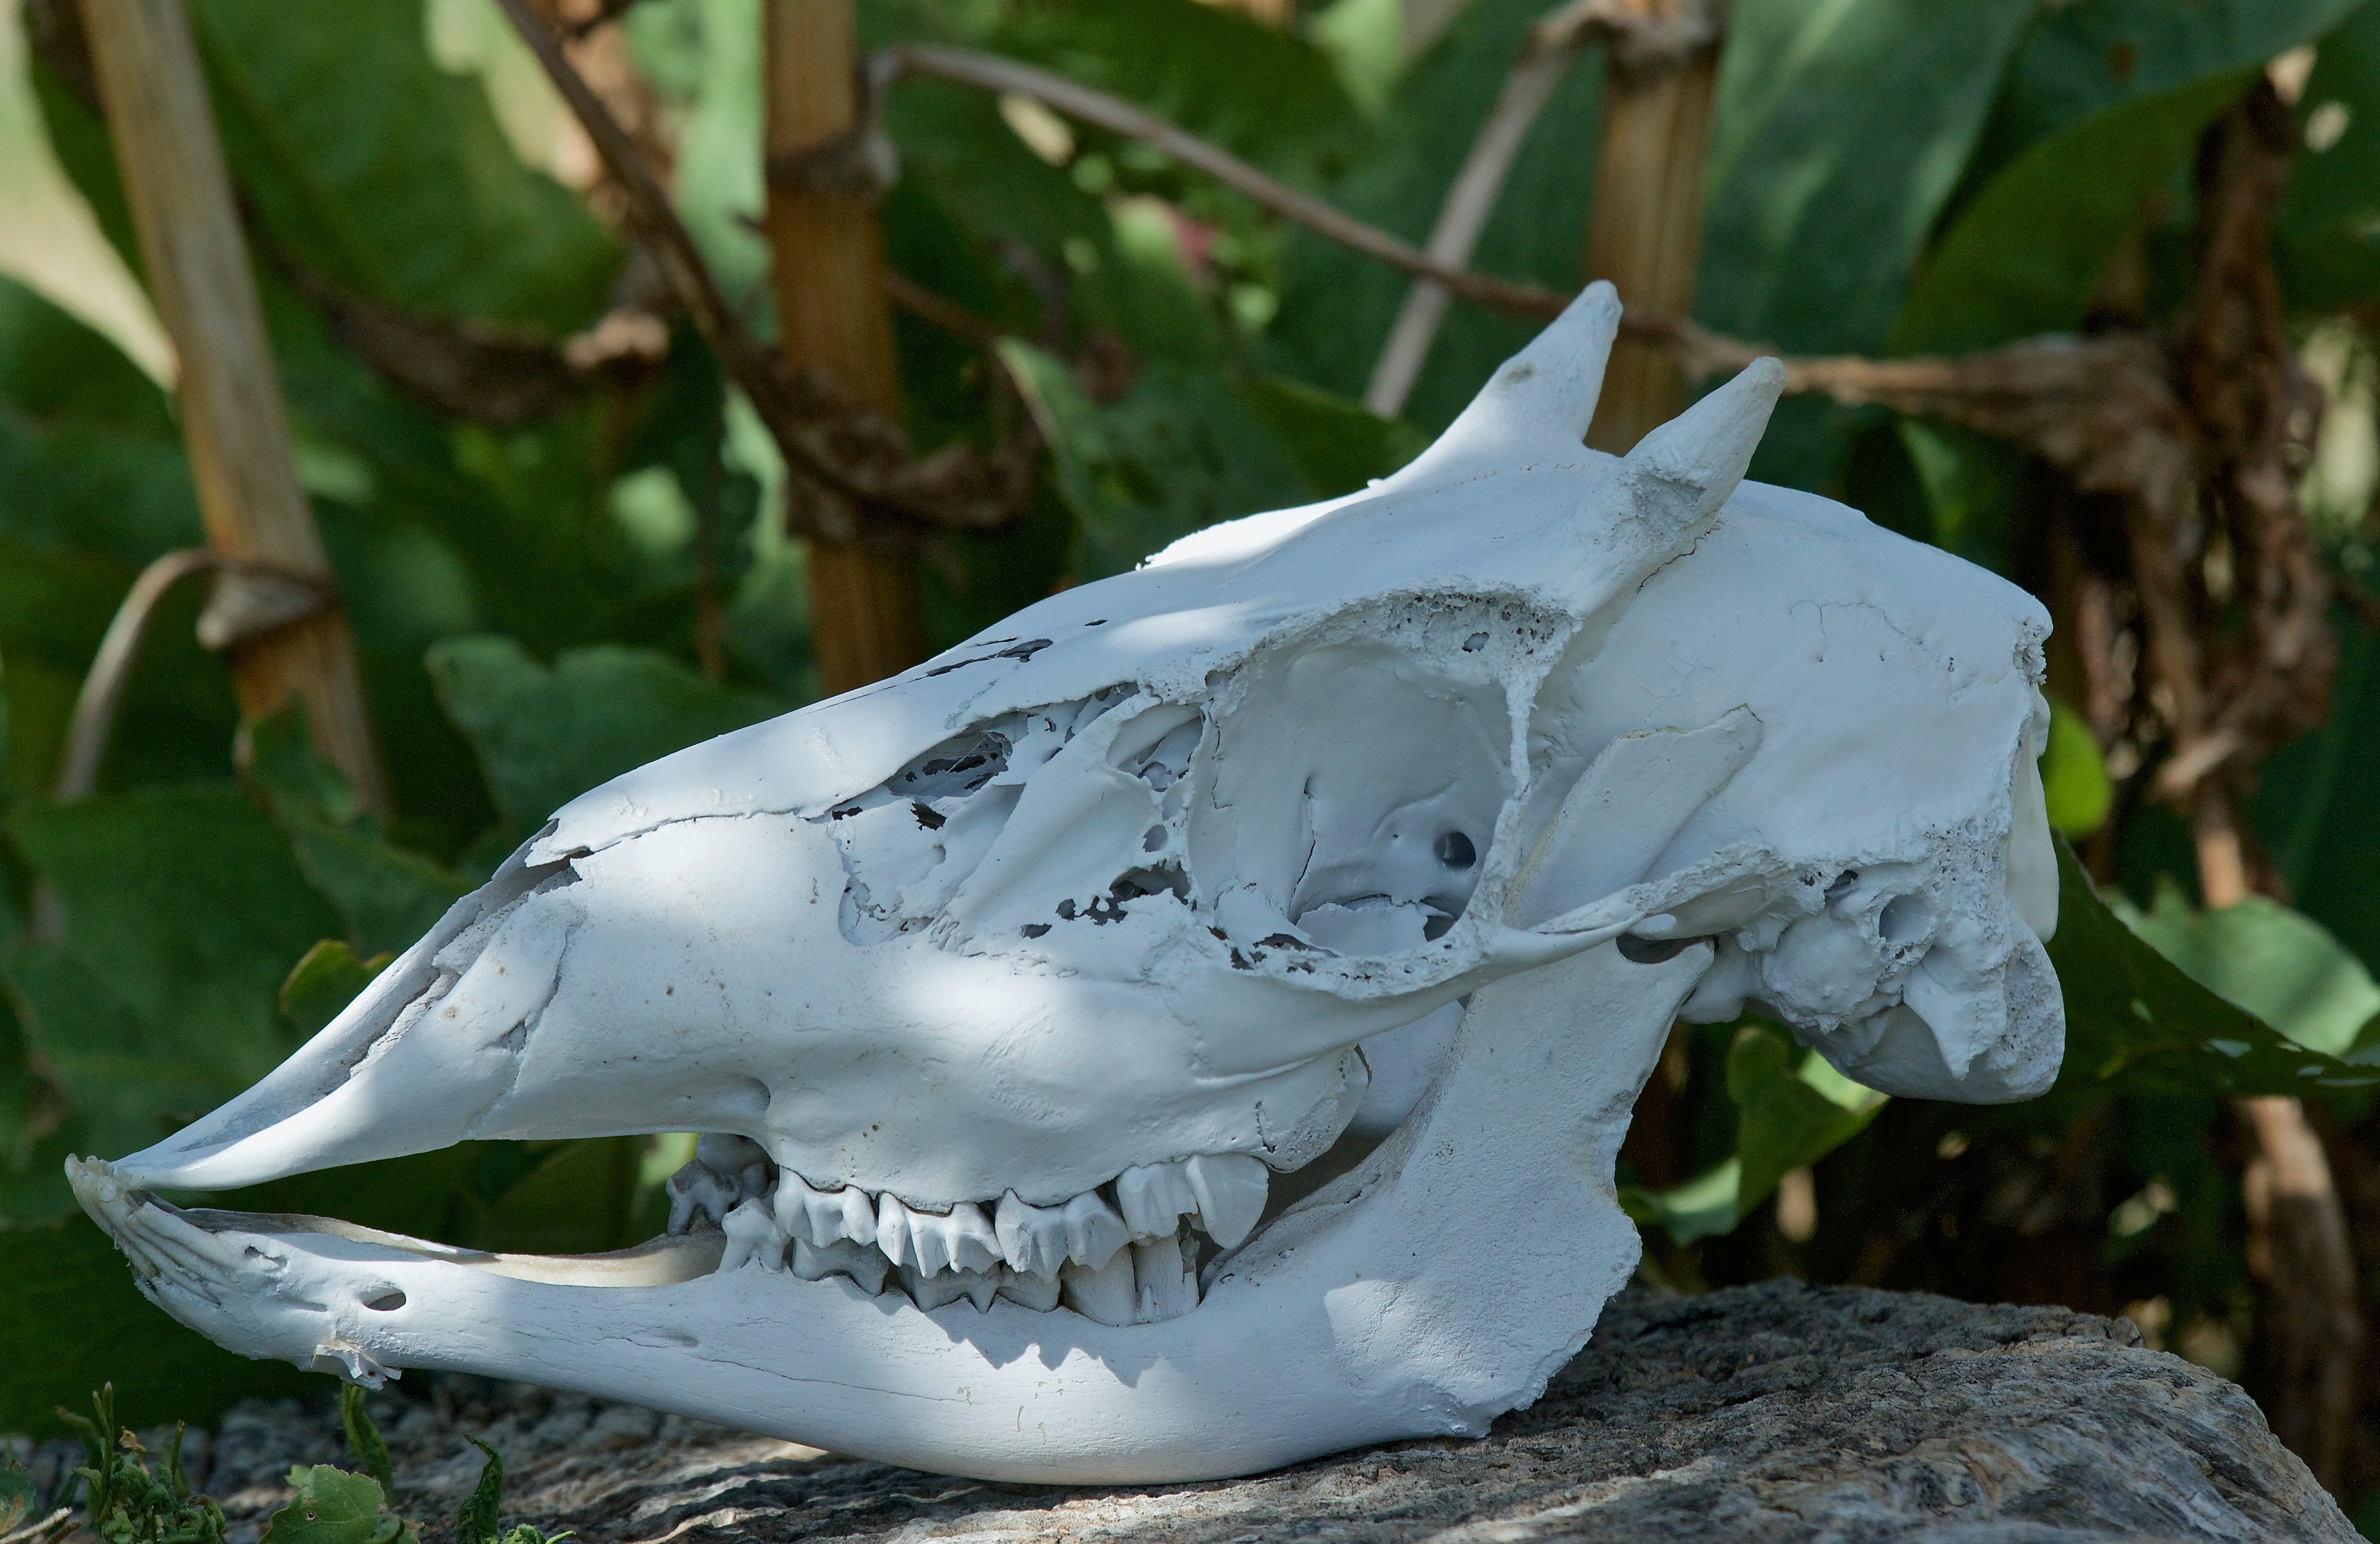 Mammal Skulls - Plants and Animals of Northeast Colorado